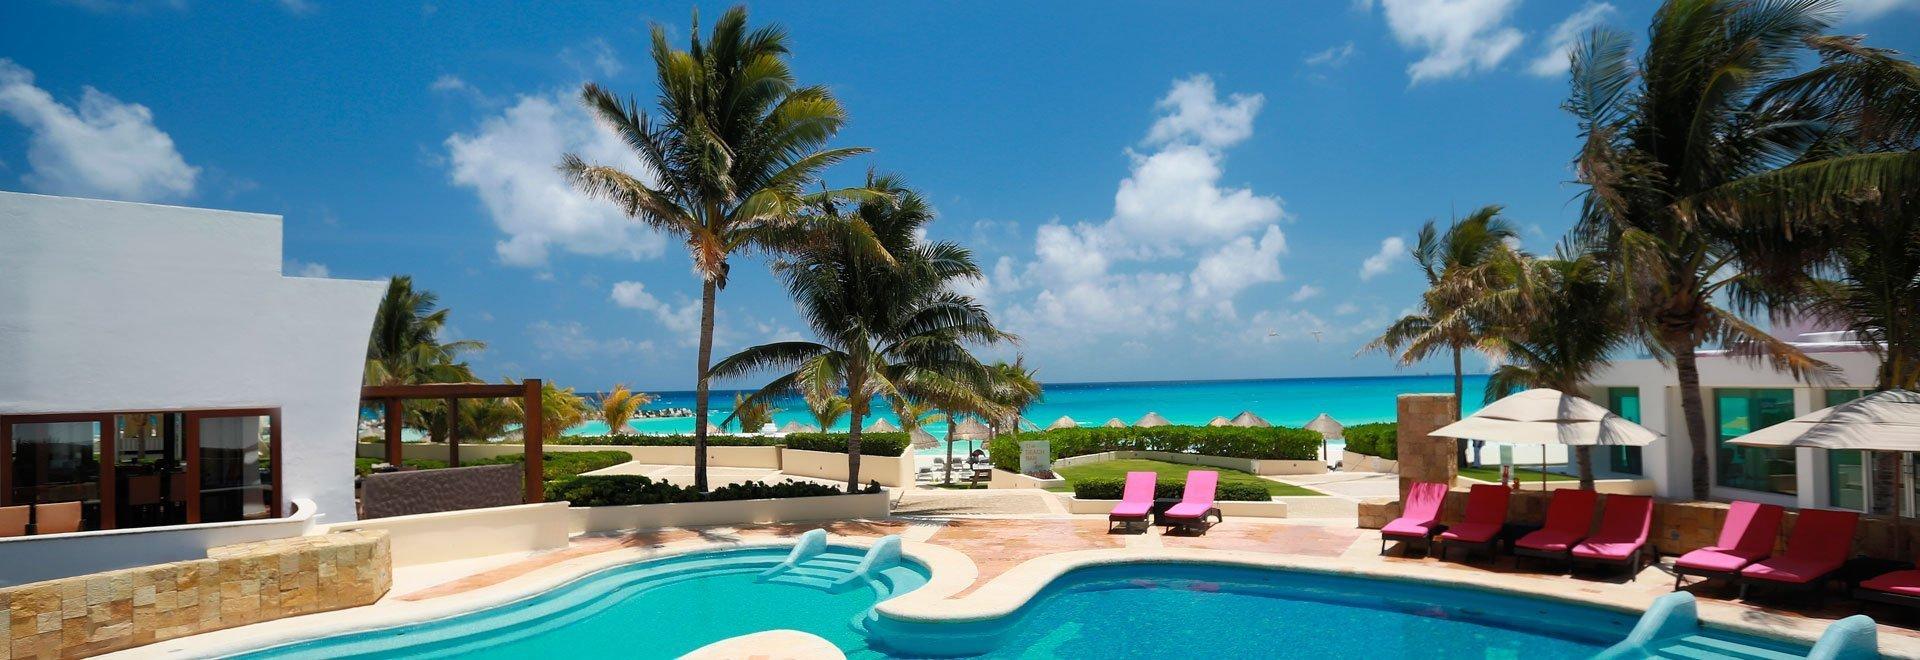 Krystal Grand Punta Cancún Hotel Descubre